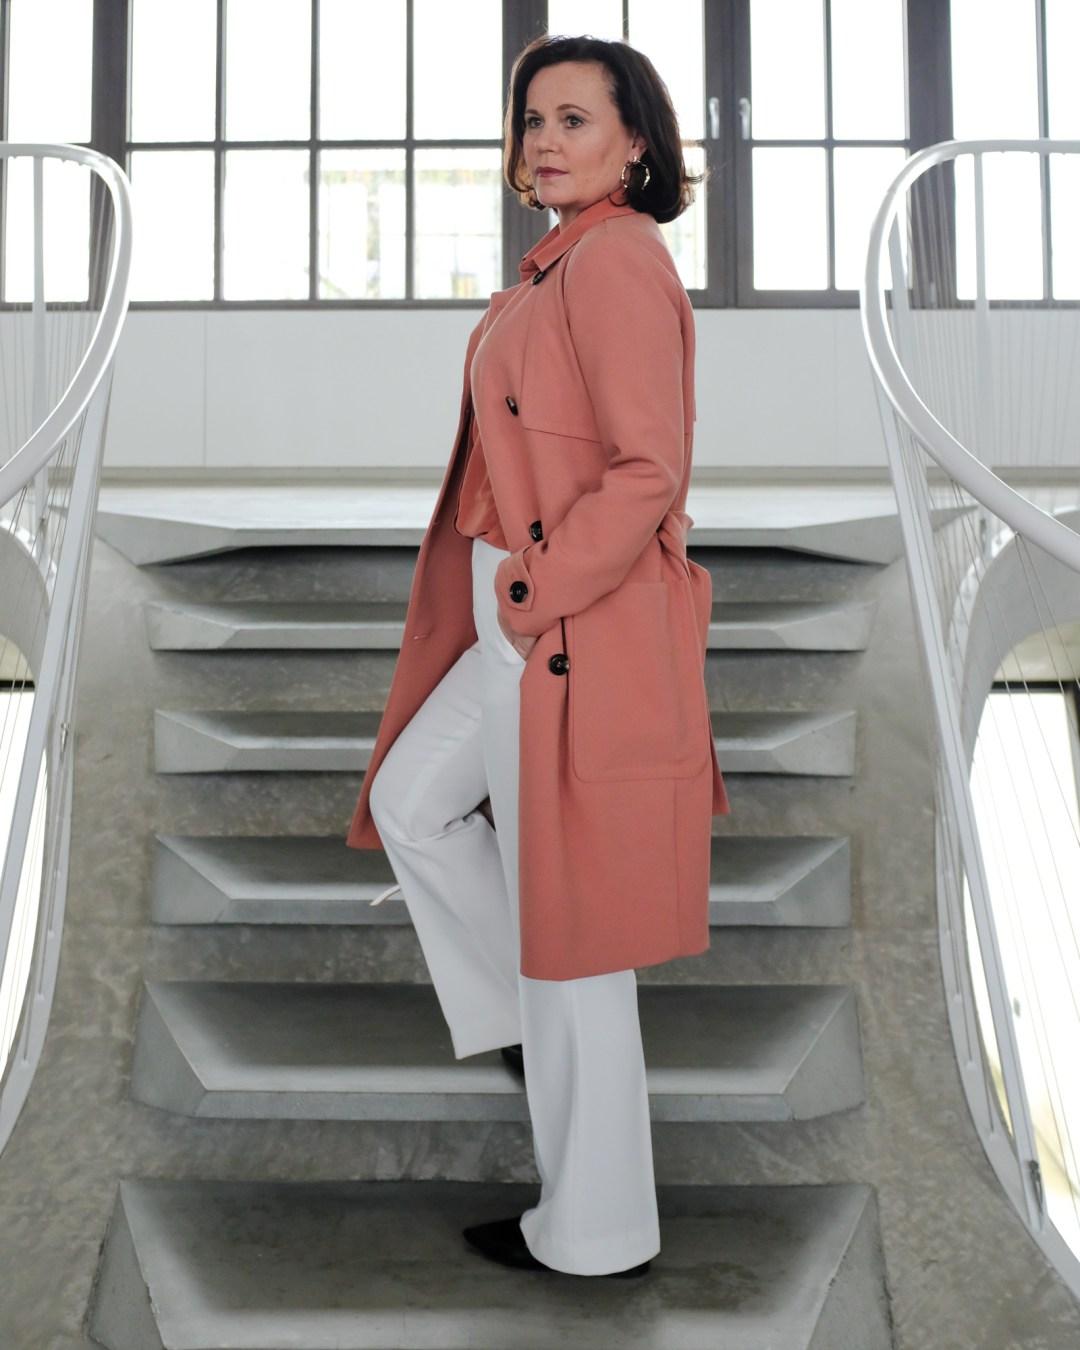 inastil, Trenchcoat, Springcoat, Frühjahrsmode, Stilberatung, Ü50Mode, Modeberatung, Frühlingsfarben, Modeblogger-9